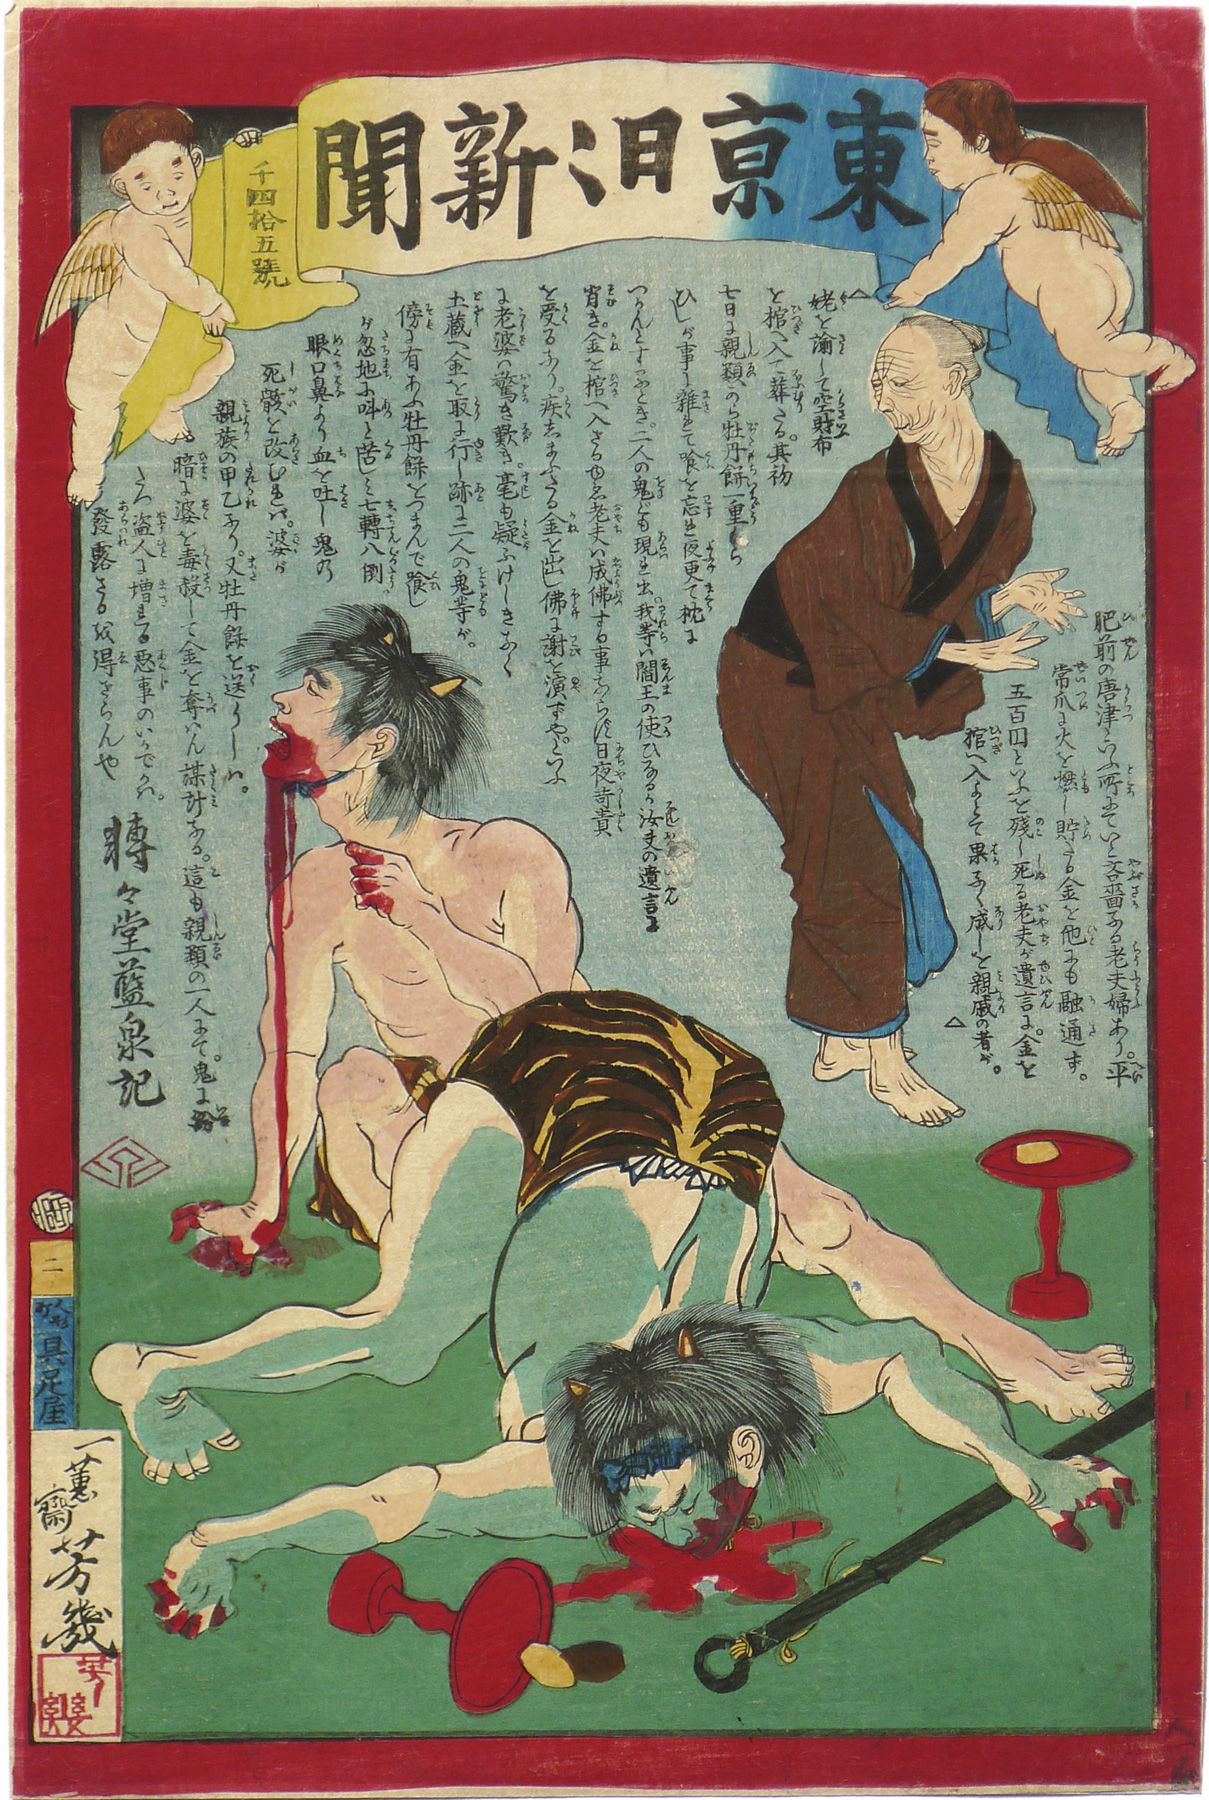 Demons and dumplings - Yosha Bunko  Tokyo nichinichi shinbun No. 1045 (1) 1875-06-15/19? (1875-08) ©  William Wetherall's archive on www.nishikie.com